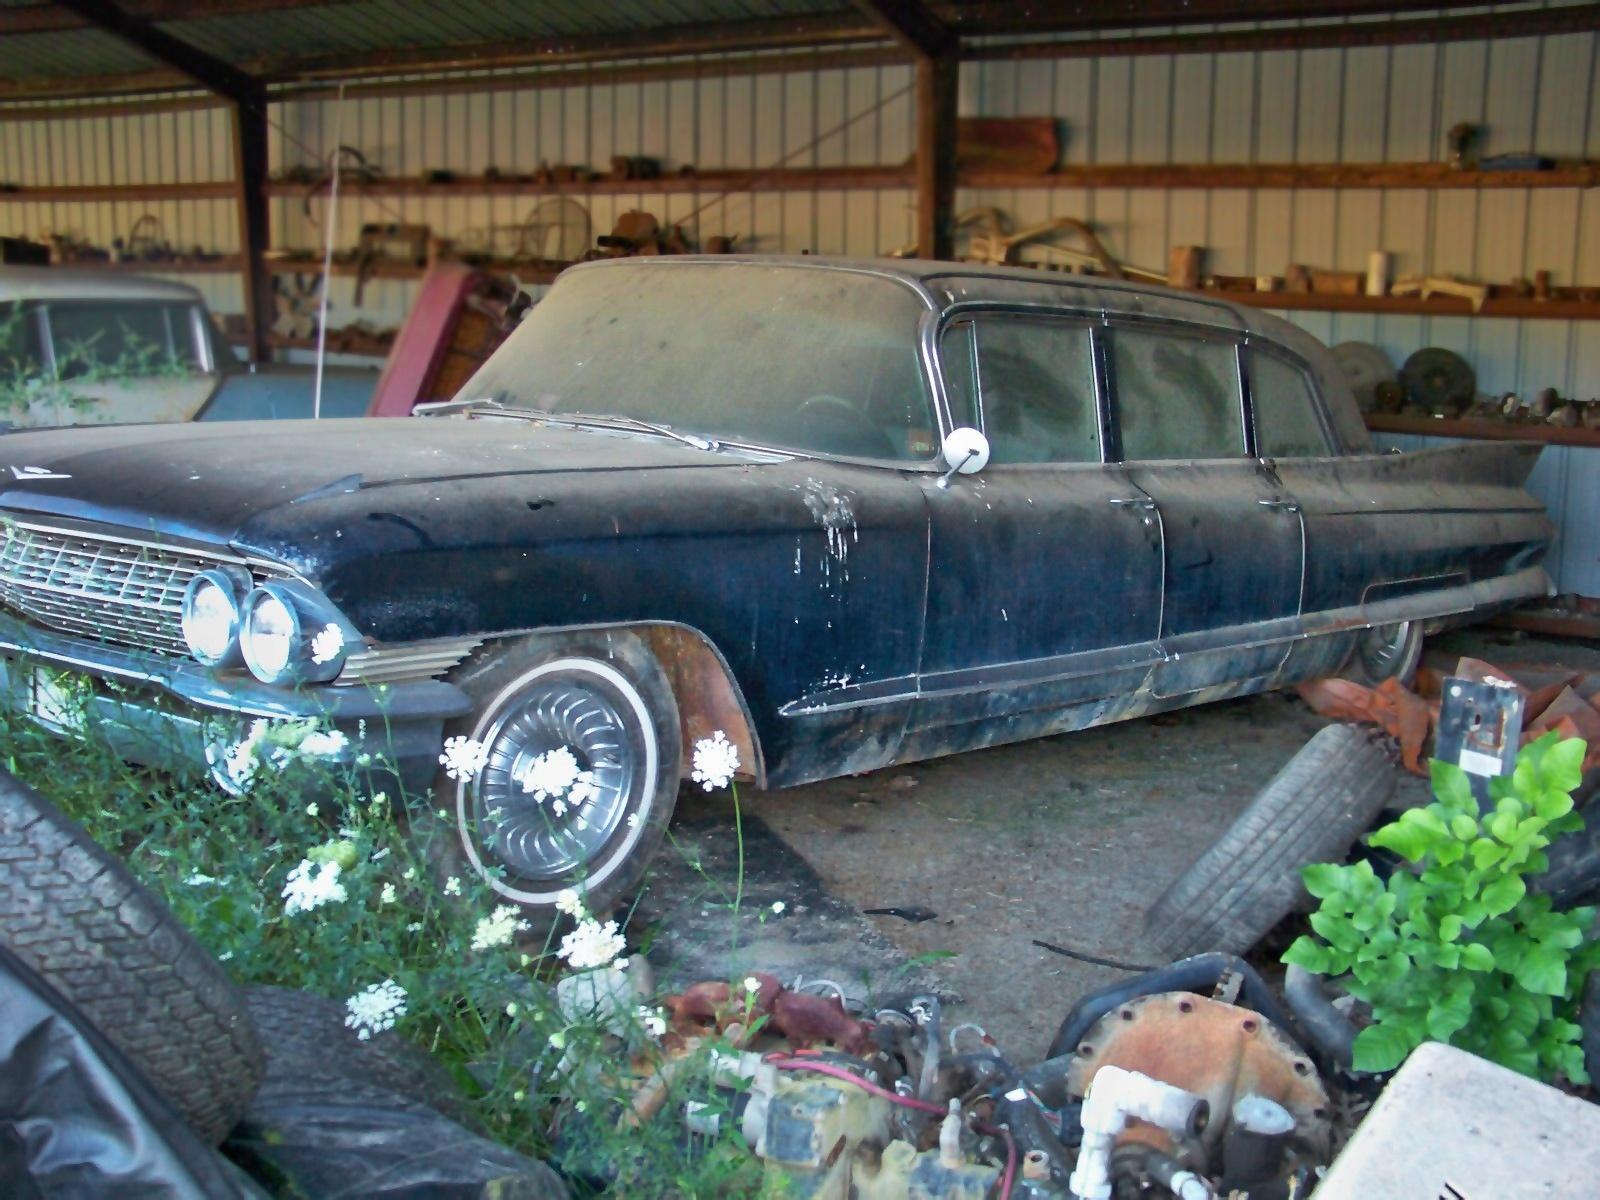 Kentucky Limo: 1961 Cadillac Fleetwood 75